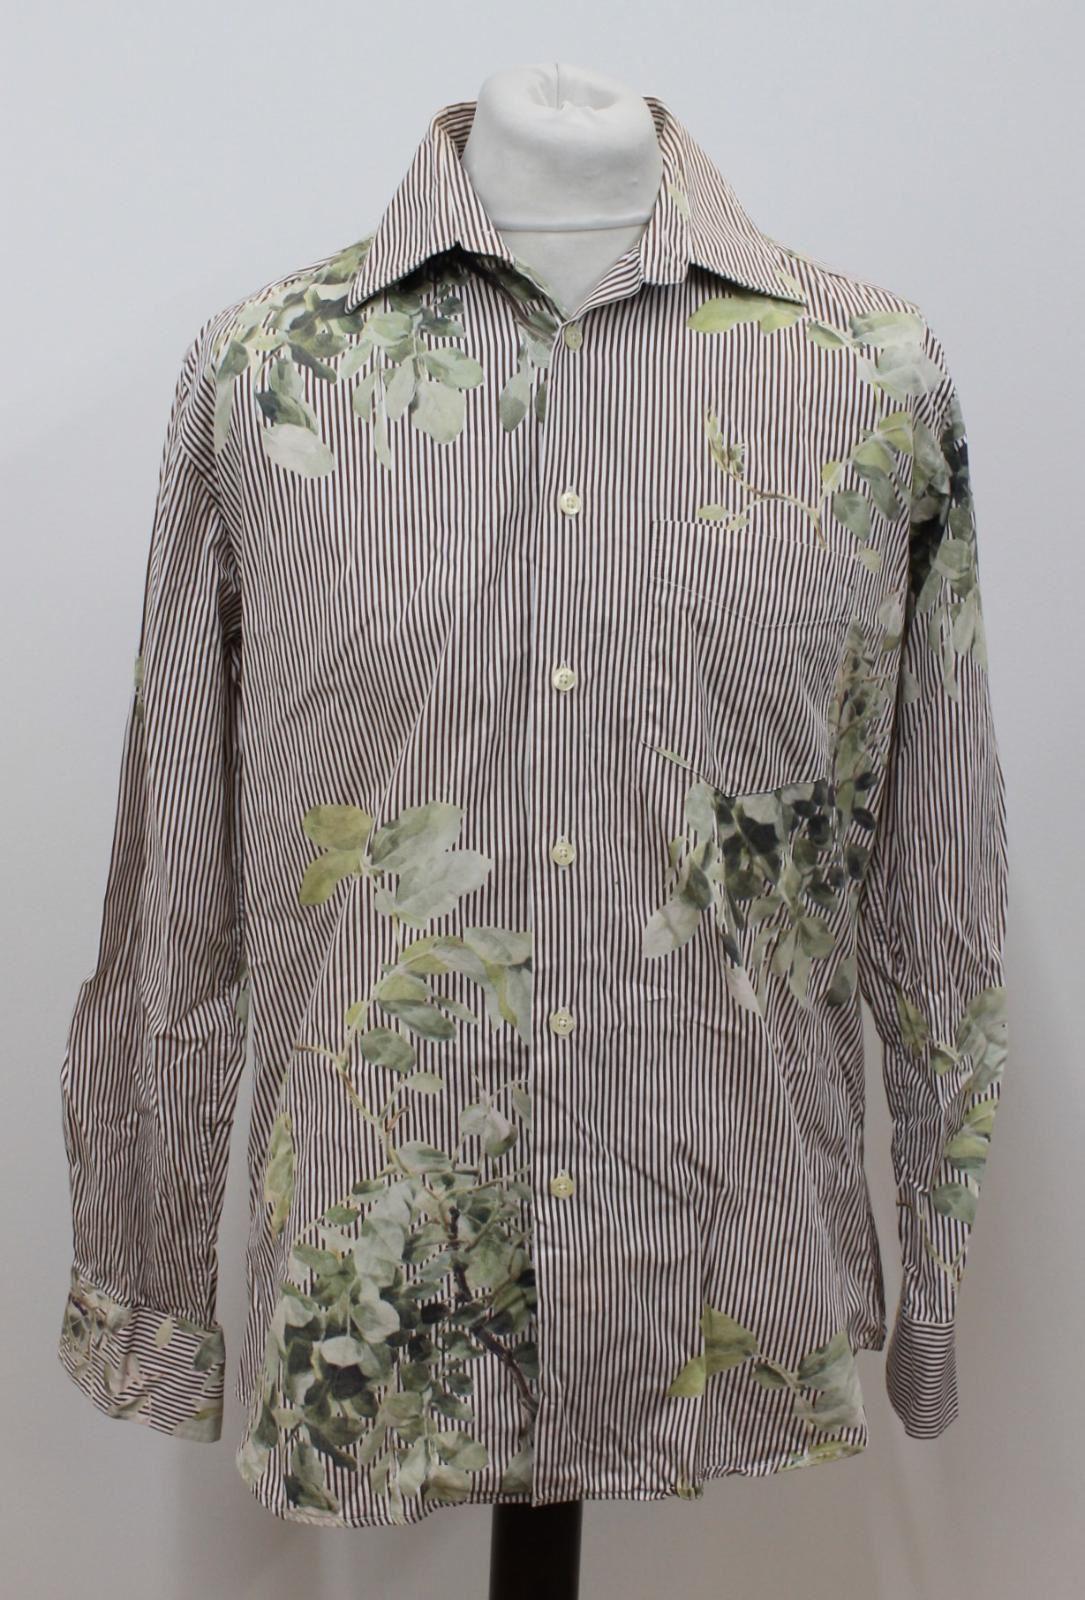 Paul-Smith-Para-Hombre-Marron-Verde-A-Rayas-Manga-Larga-de-impresion-de-hojas-Algodon-Camisa-Tamano